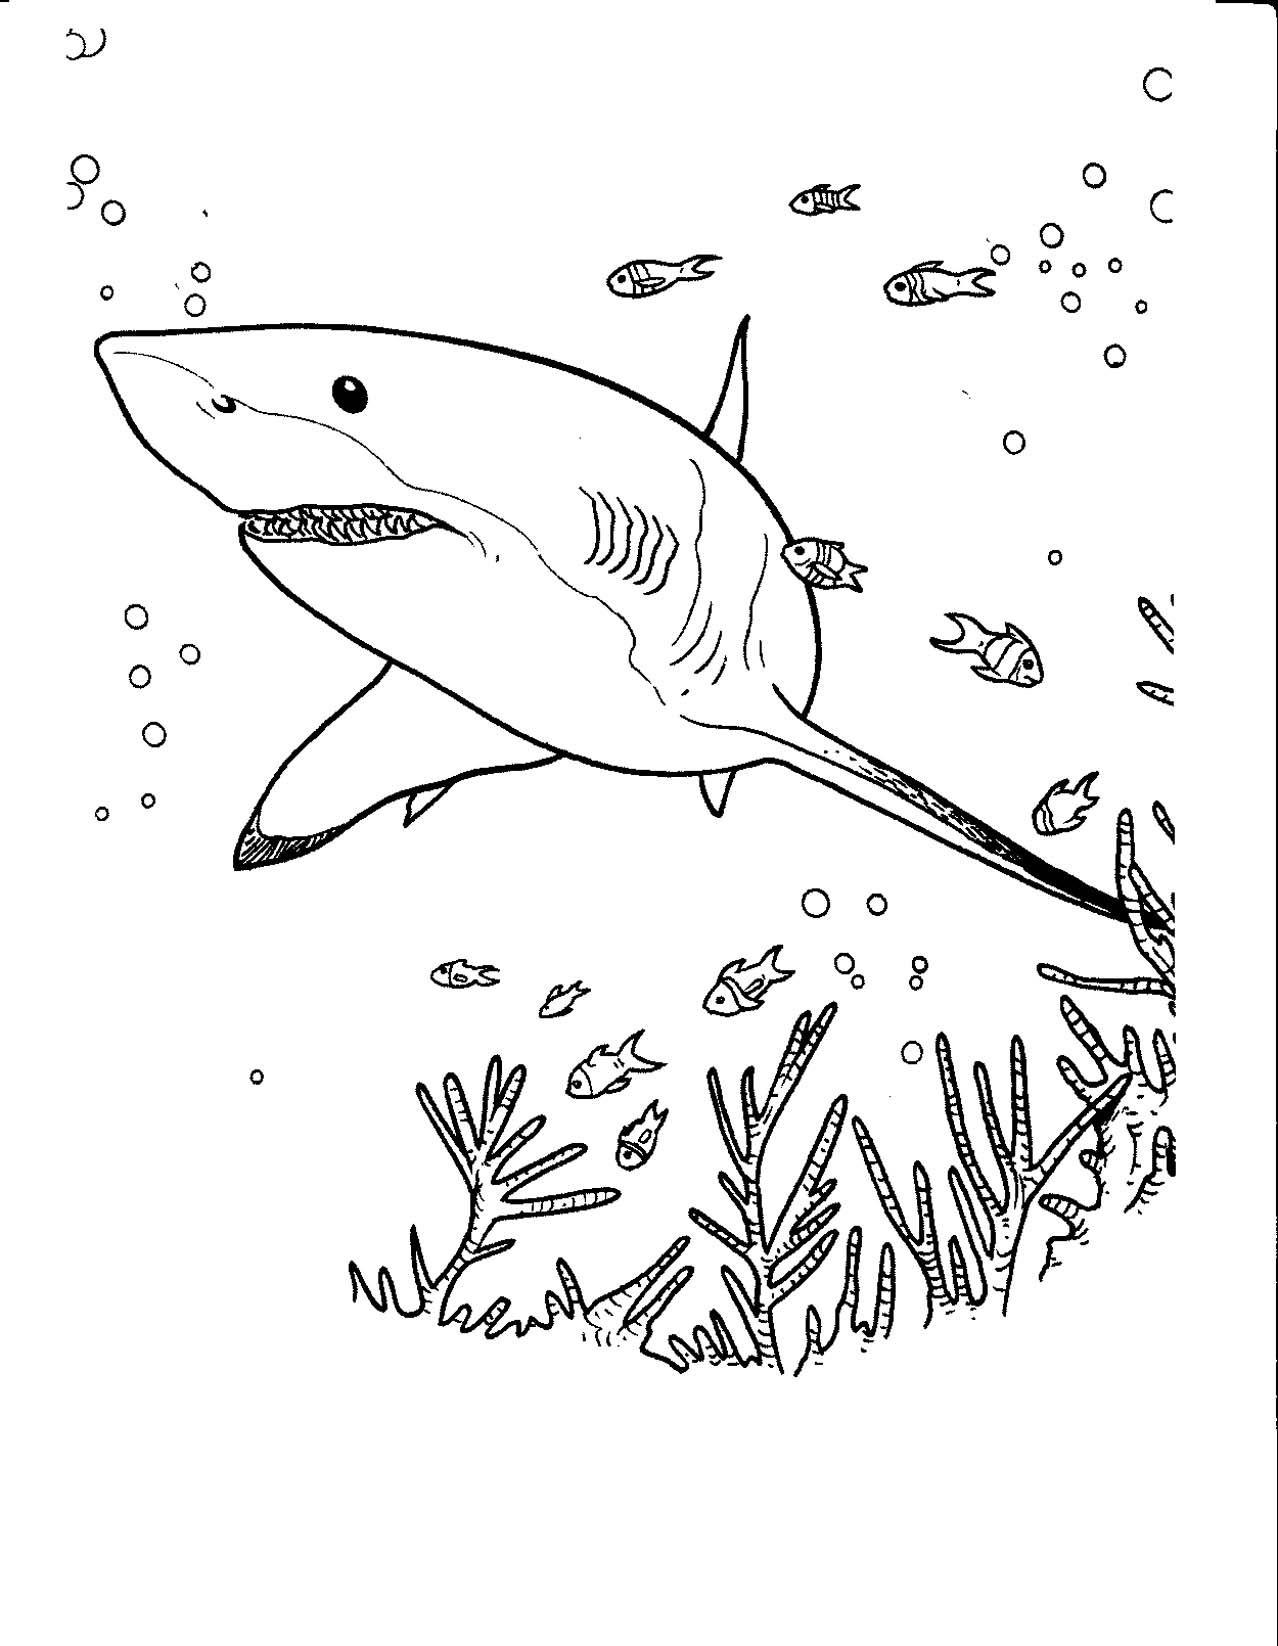 Pin By Jarrod Coomer On Under Sea Spring Summer 2019 Sunday School